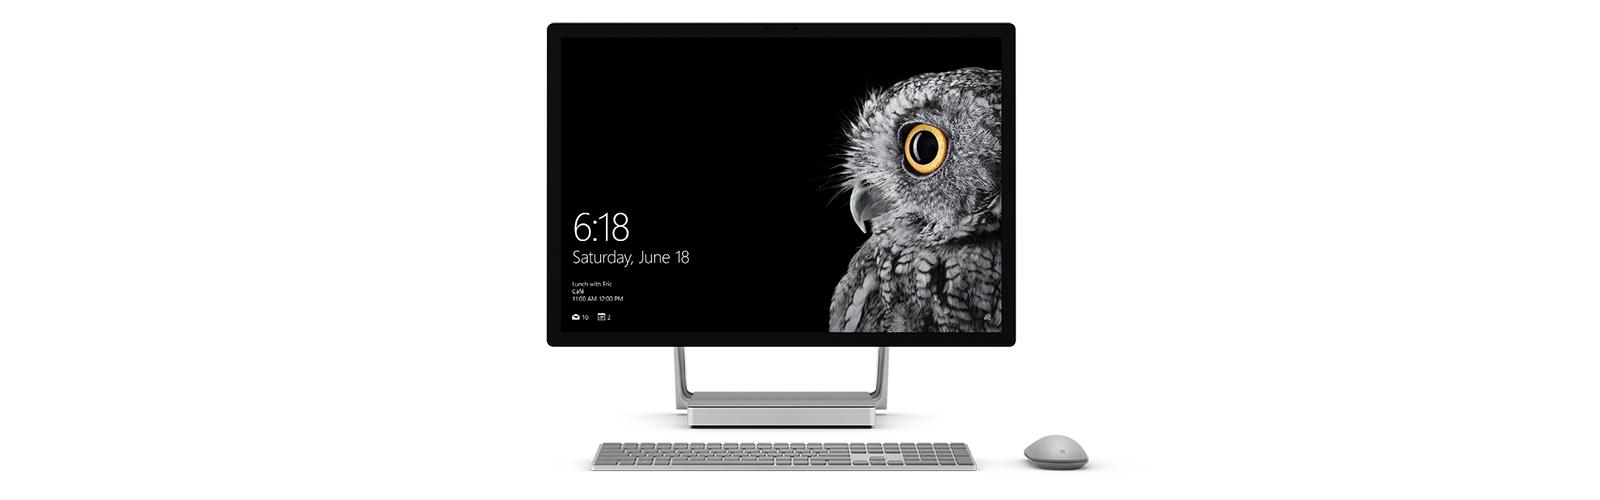 Surface Studio 處於直立模式,還有 Surface 滑鼠和鍵盤。